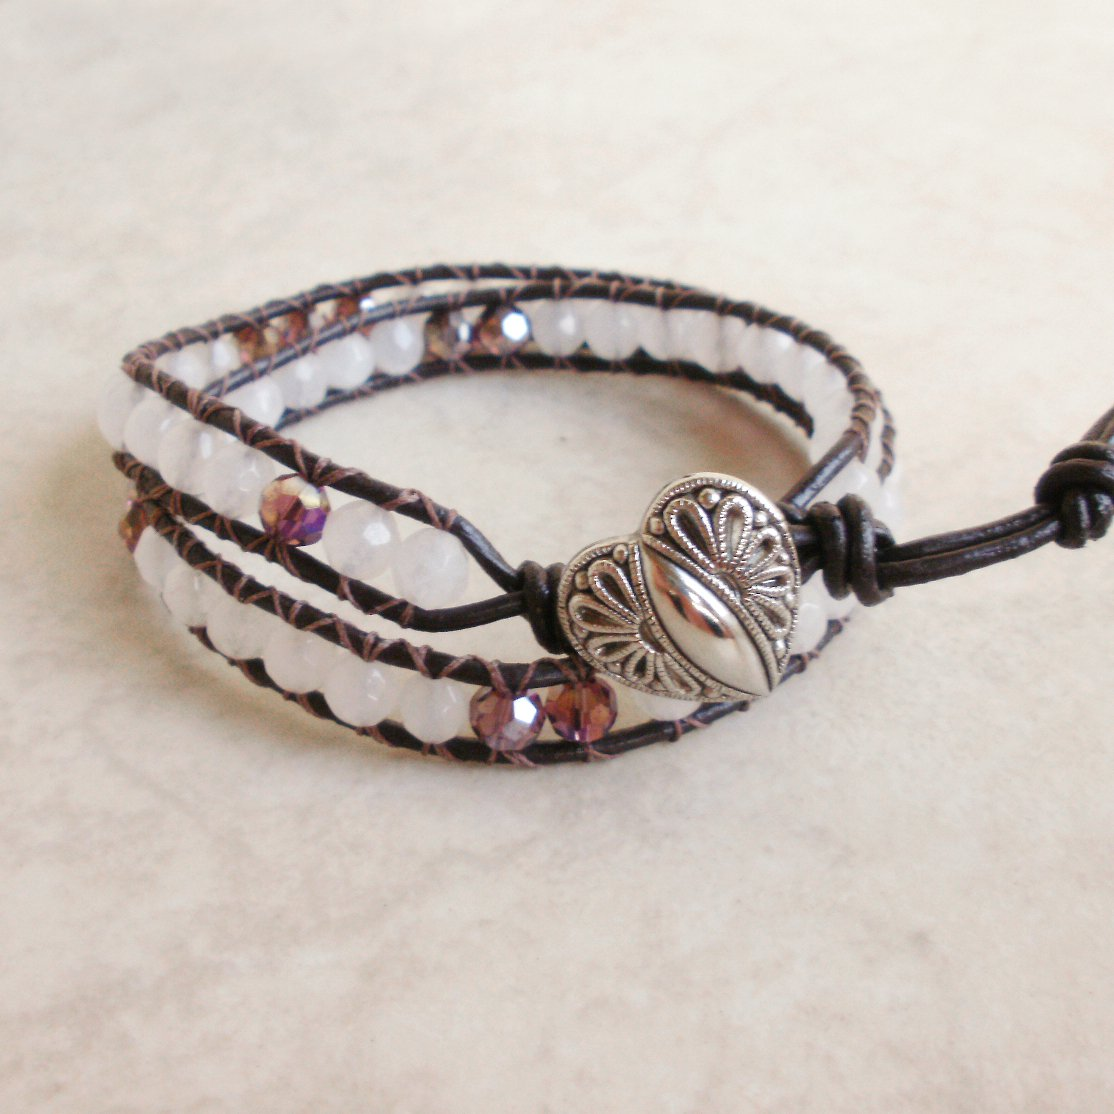 Rose Quartz Beaded Leather Wrap Bracelet